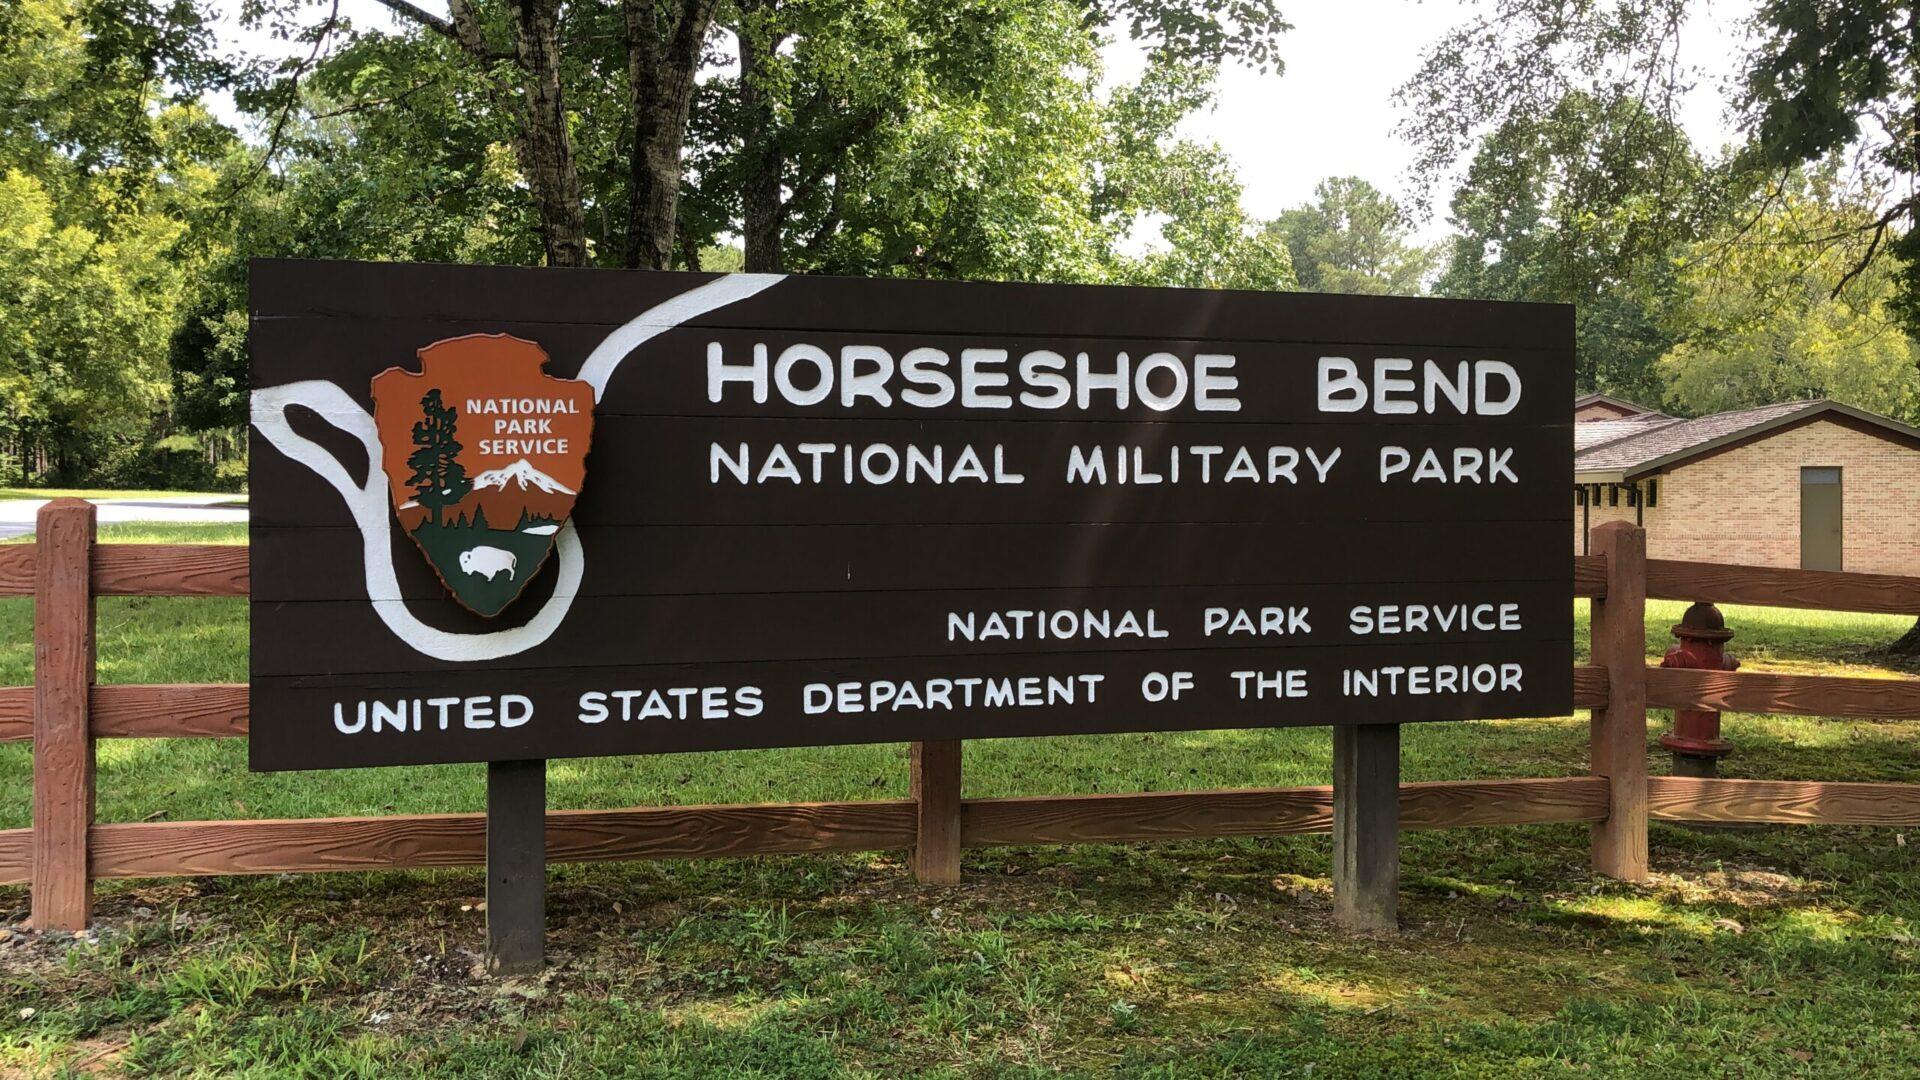 horseshoe bend national military park sign